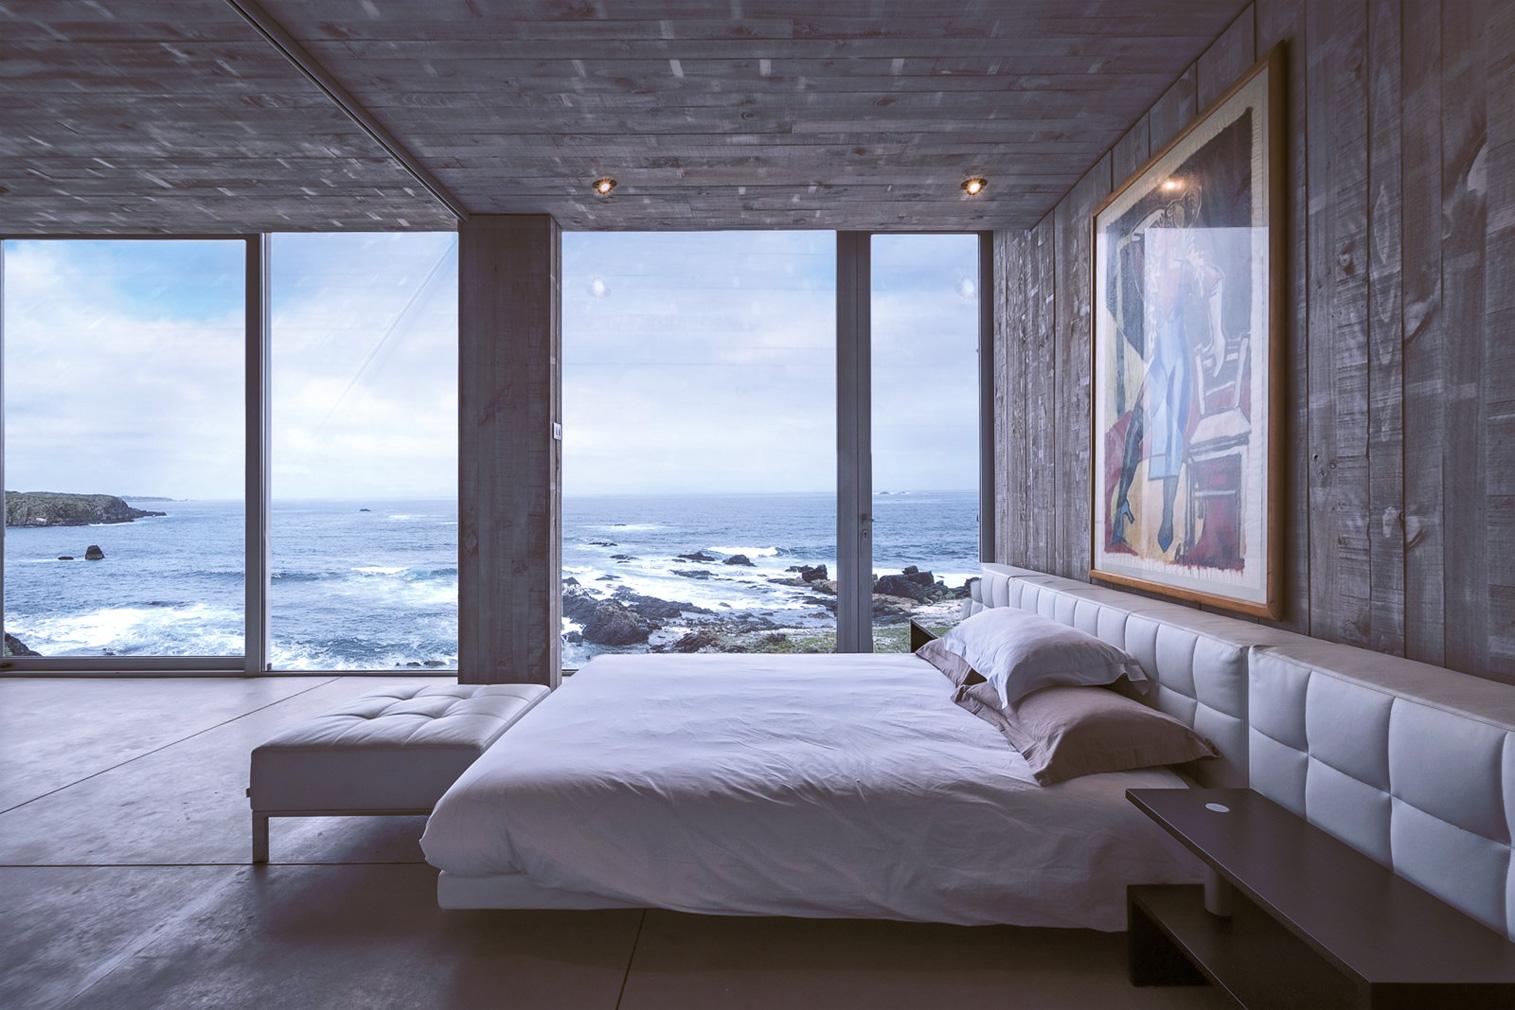 Property of the week: a 'primitive' Chilean holiday home by Pritzker Prize-winner Alejandro Aravena